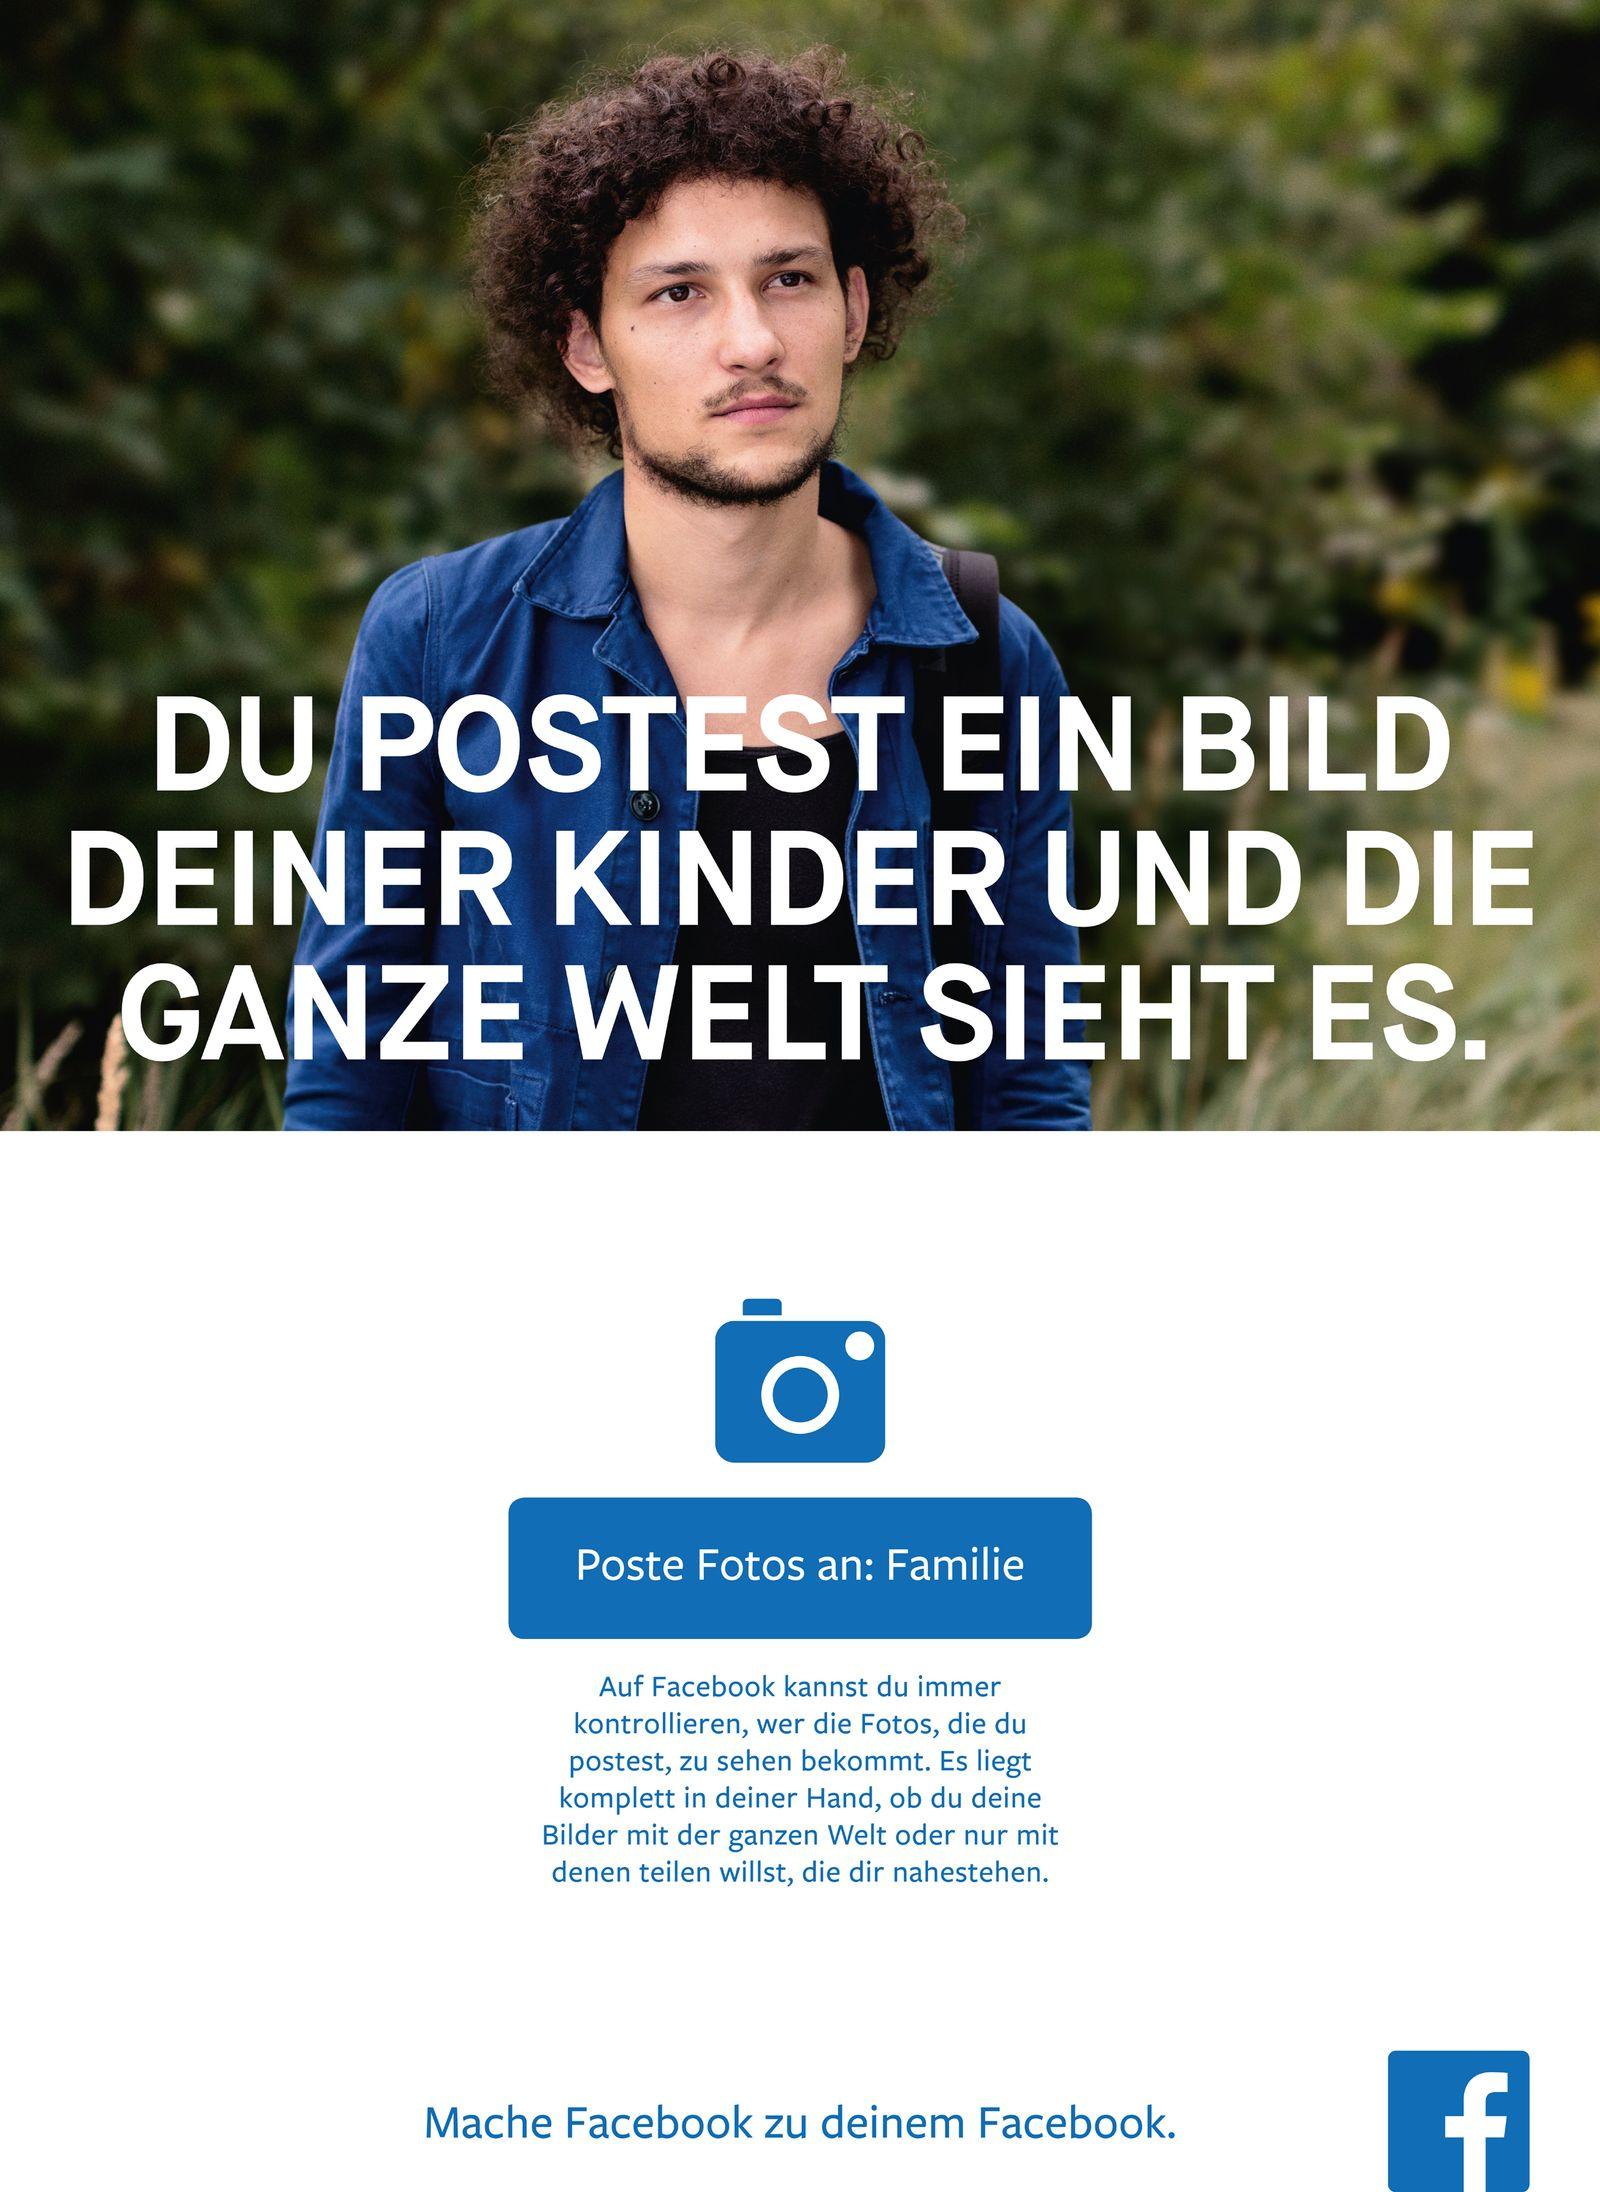 NUR ALS ZITAT Screenshot Facebook Werbung